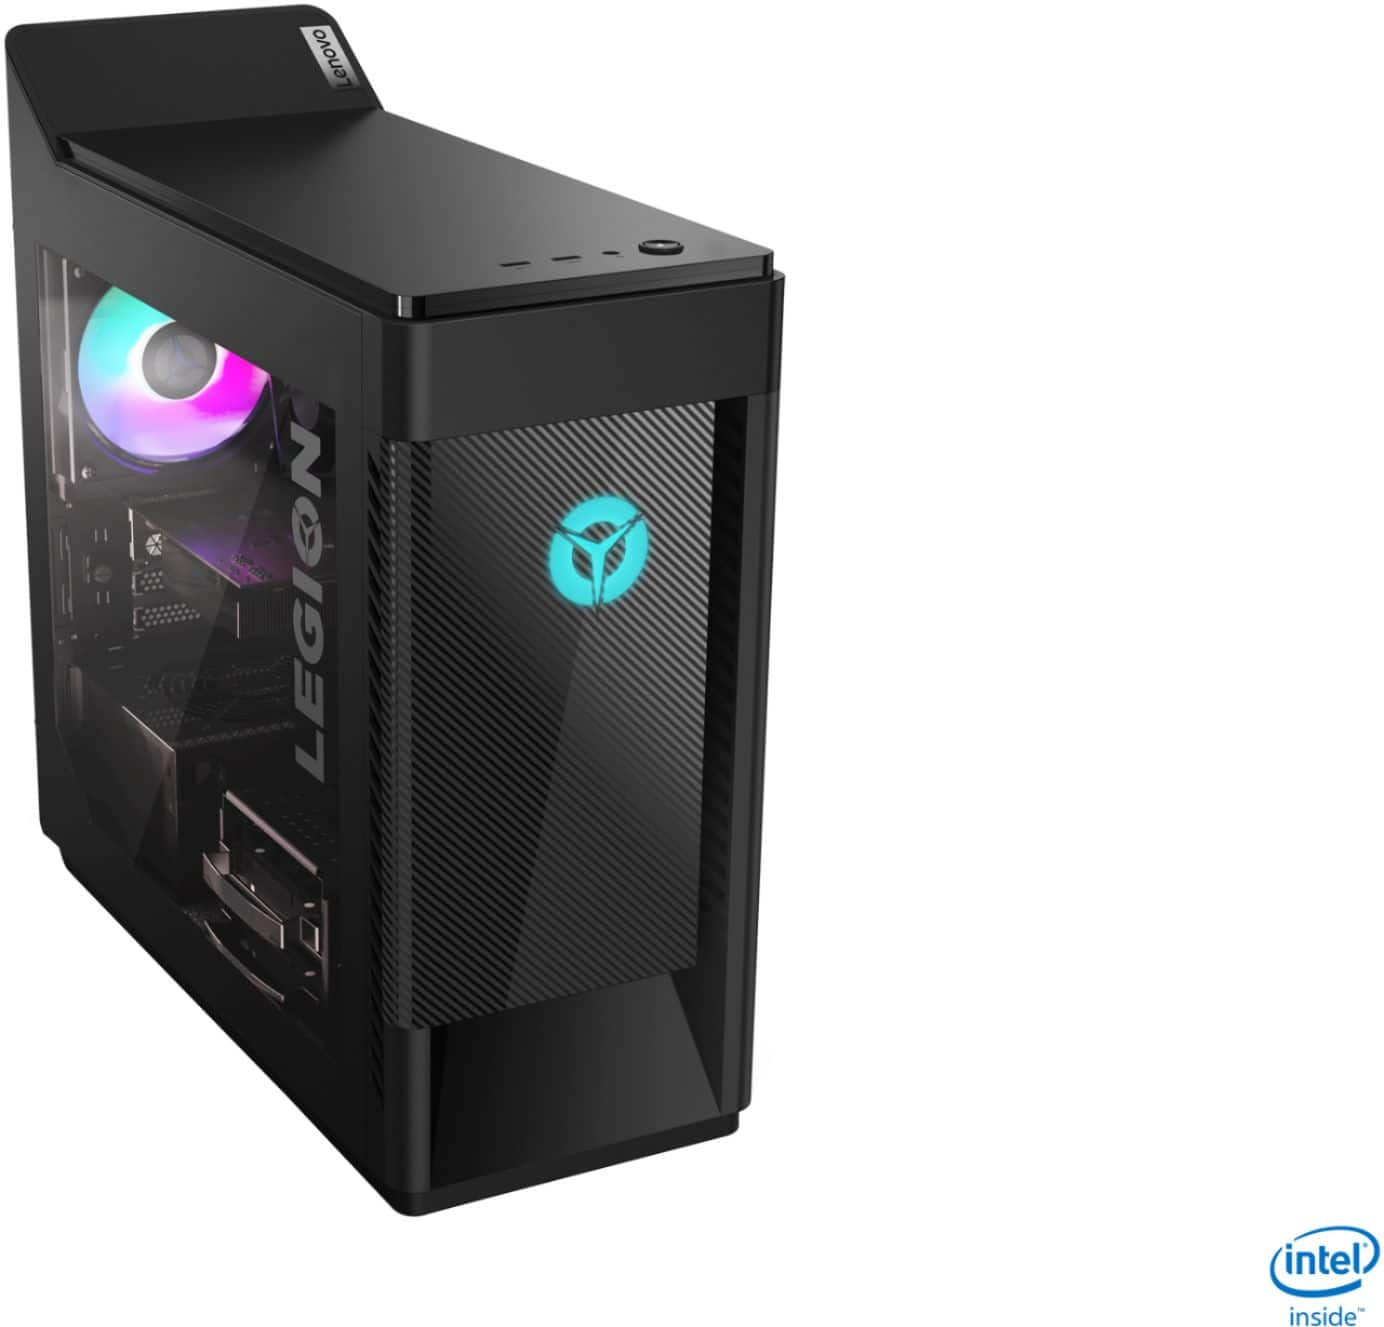 Lenovo Legion T5 - GTX 1660 Super, Intel I5-10400F - $683.99 + tax